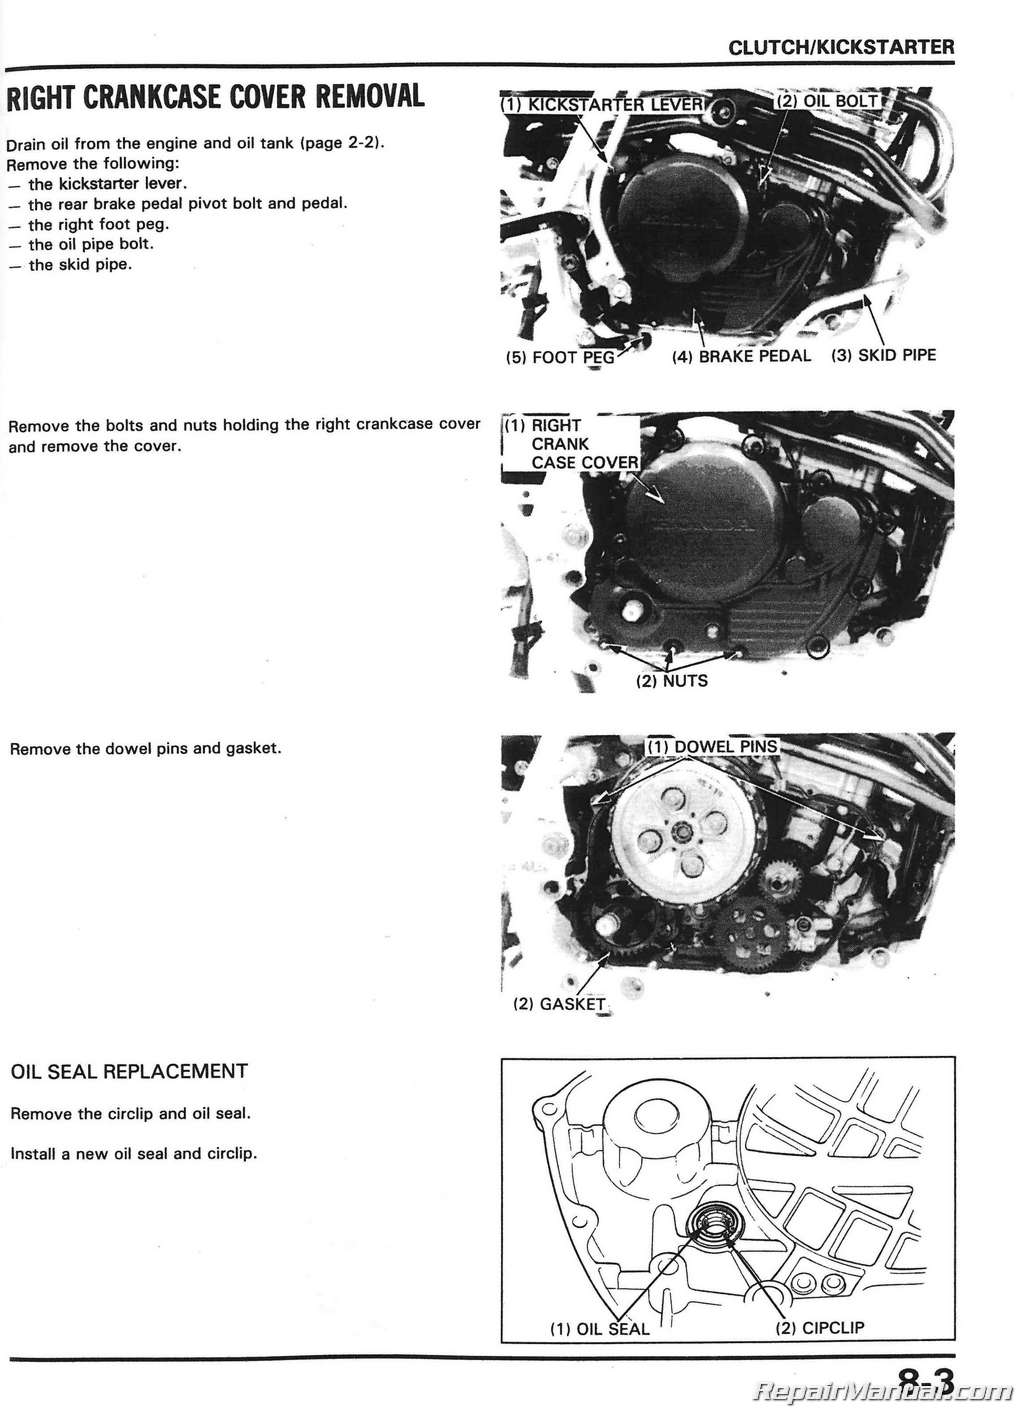 1988 2000 honda xr600r motorcycle service manual rh repairmanual com honda xr600r service manual pdf honda xr600 service manual pdf